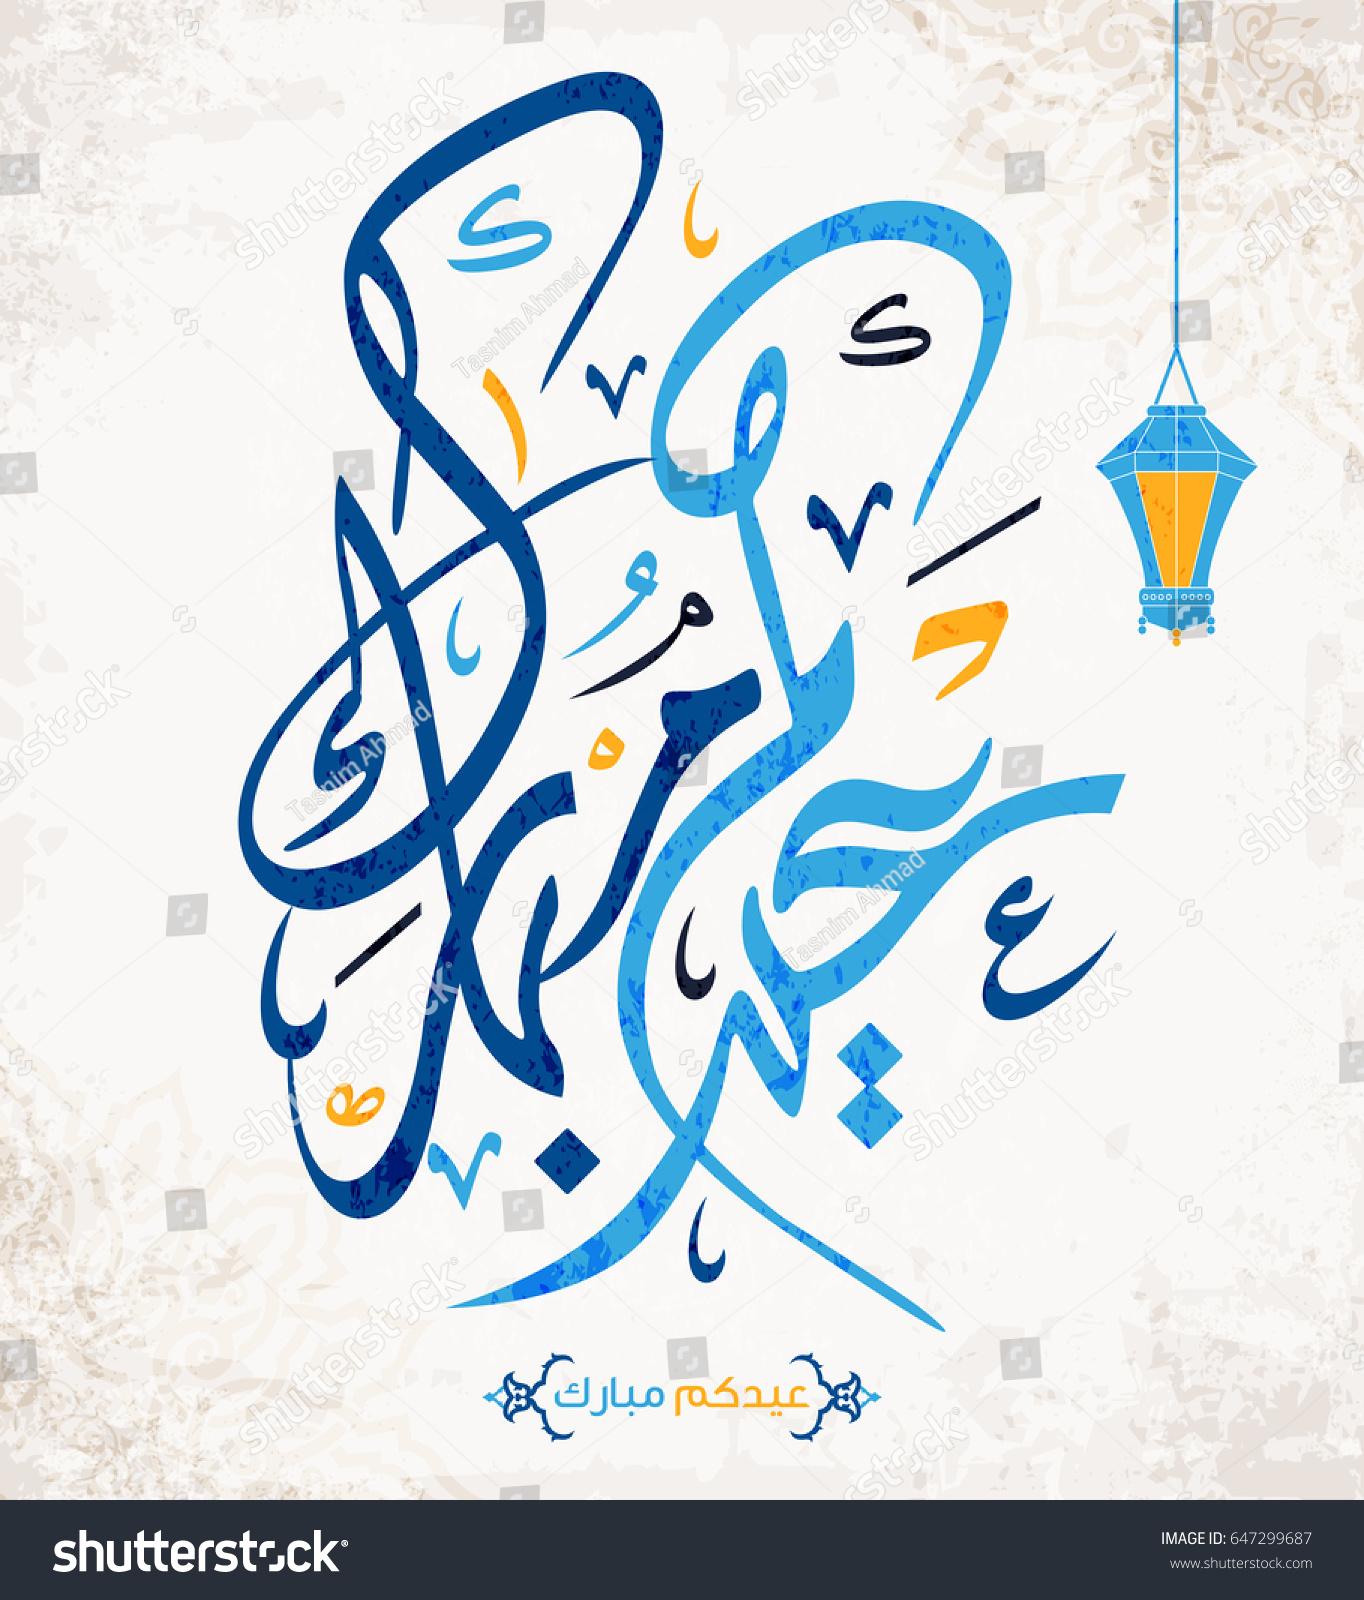 Eid mubarak greeting card arabic calligraphy stock vector eid mubarak greeting card in arabic calligraphy style specially for eid celebrations kristyandbryce Choice Image